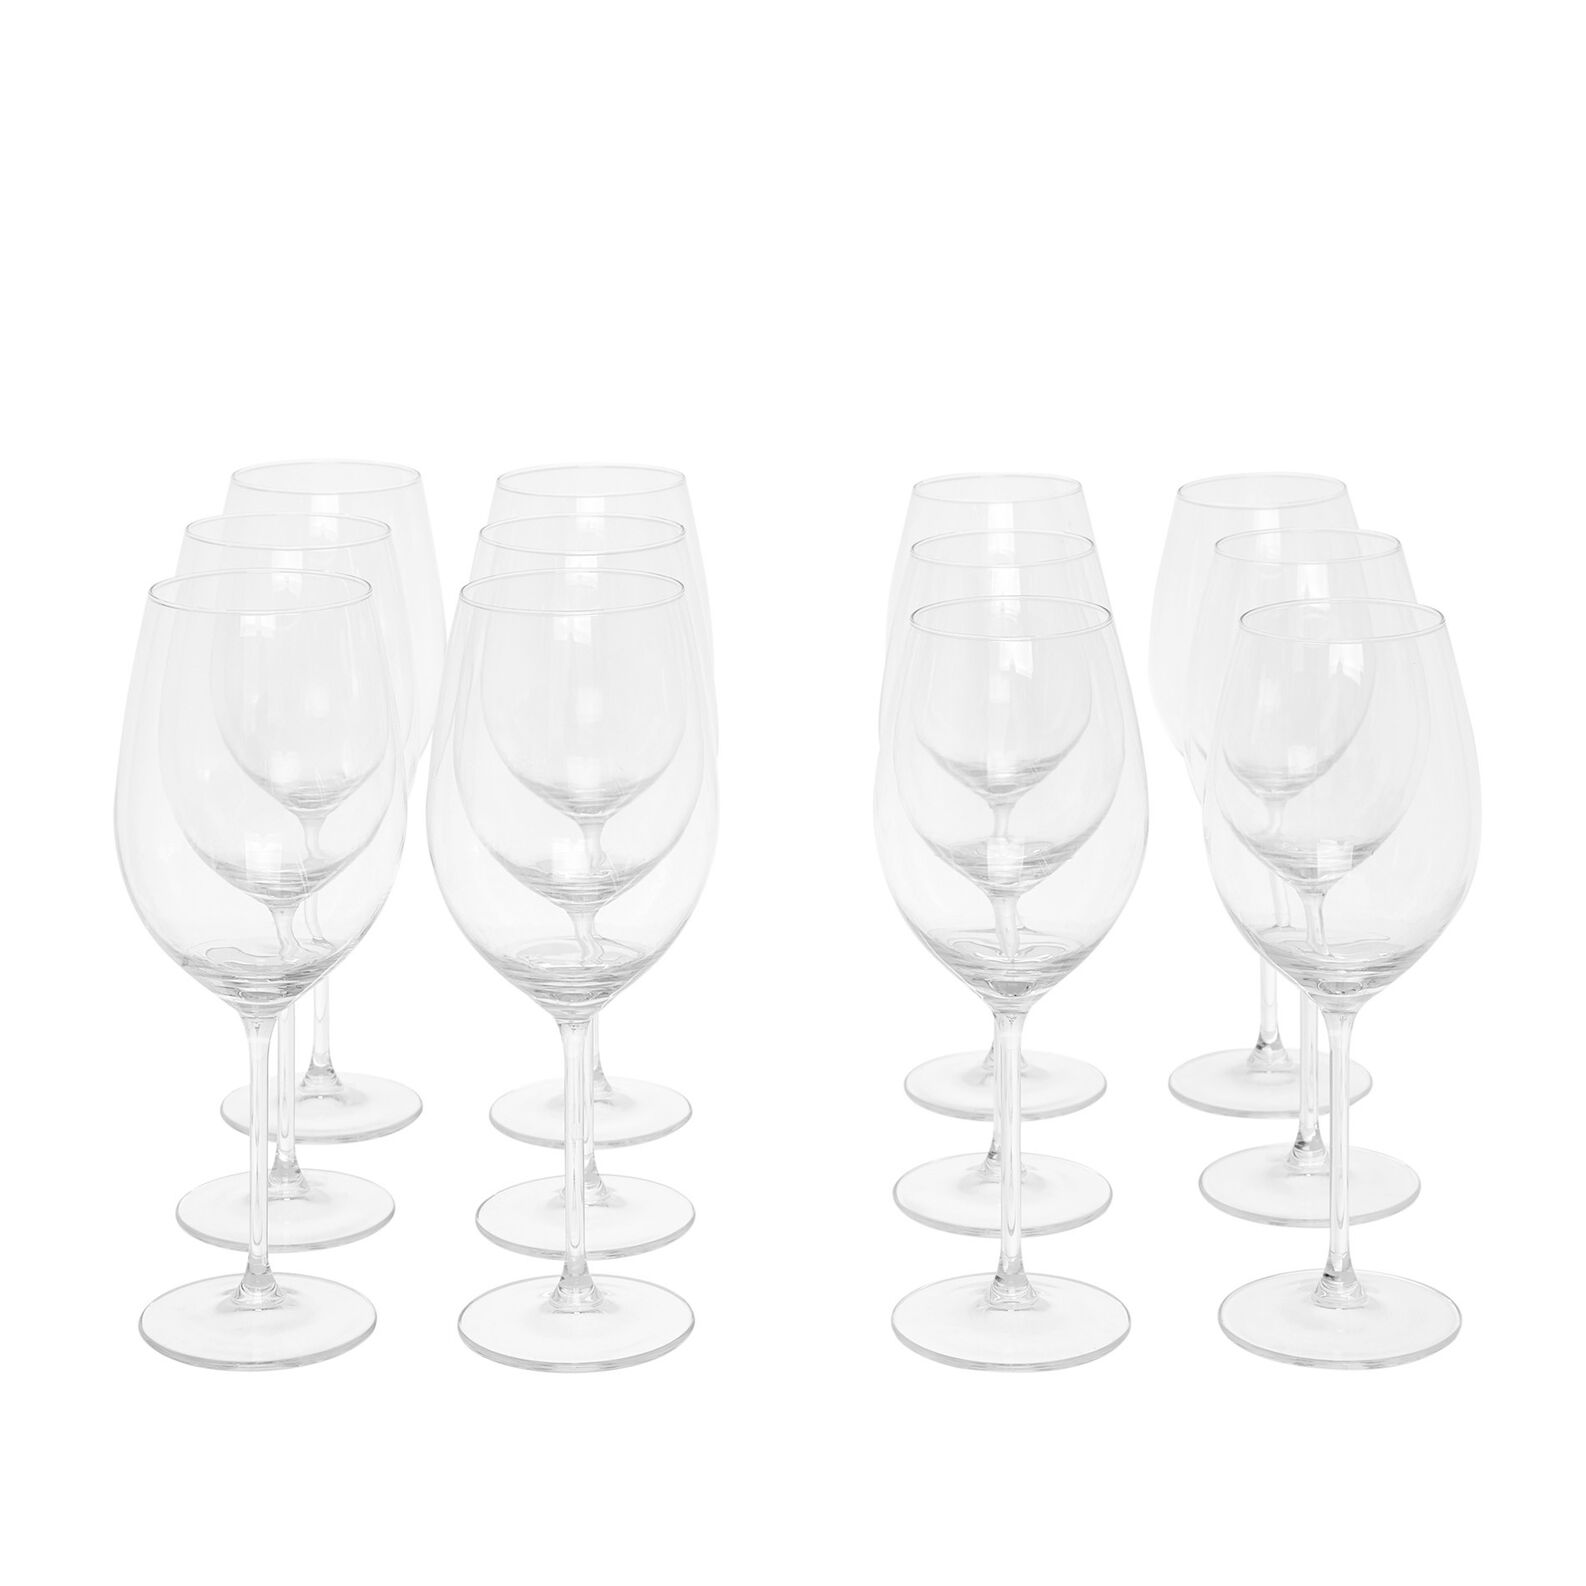 Set of 12 goblets in Royal glass